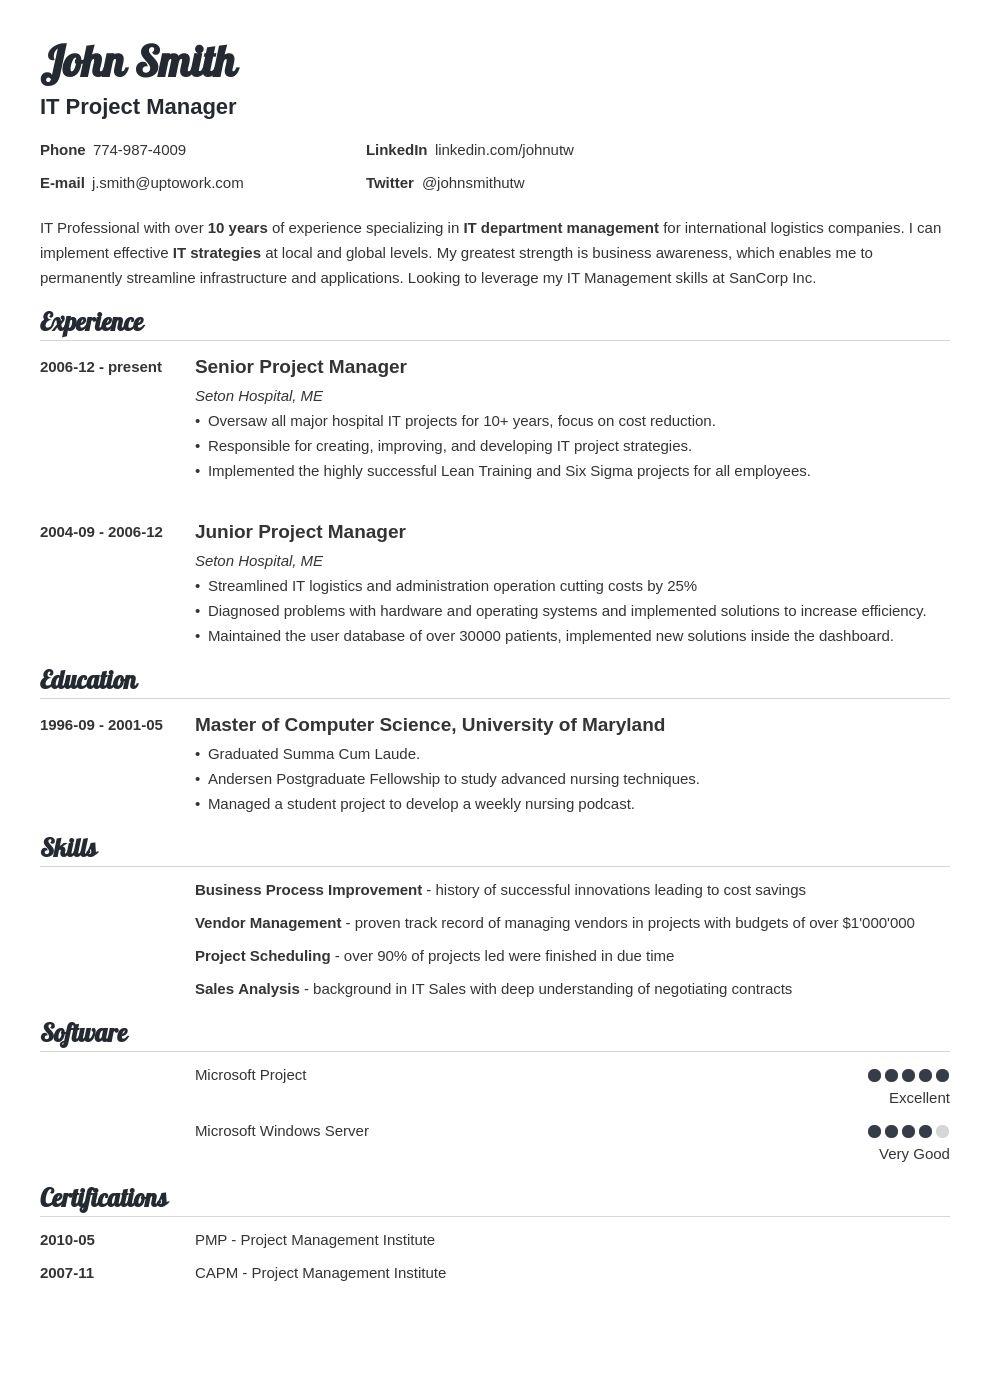 Free Resume Templates Uptowork Resume templates, Resume